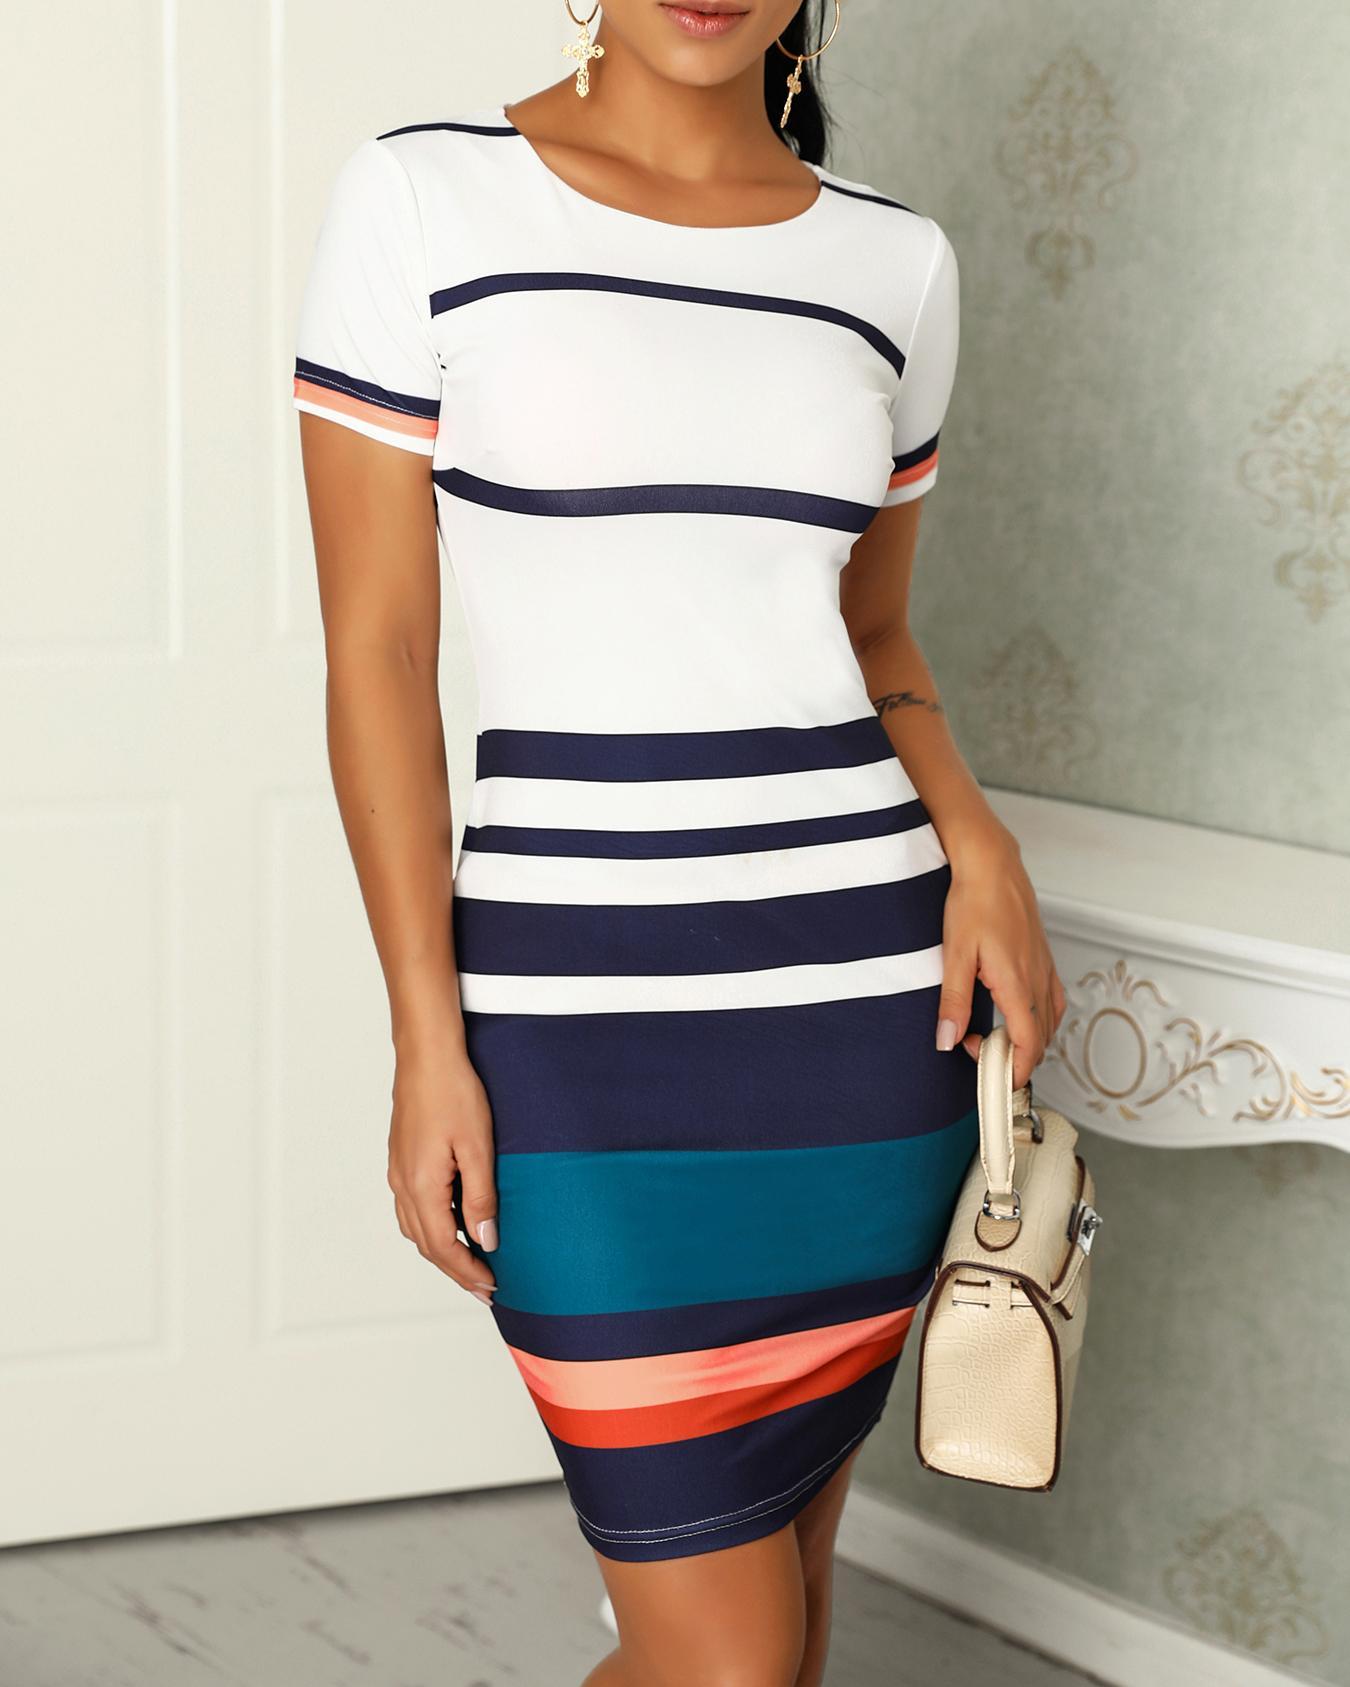 Contrast Color Splicing Striped Casual Dress фото